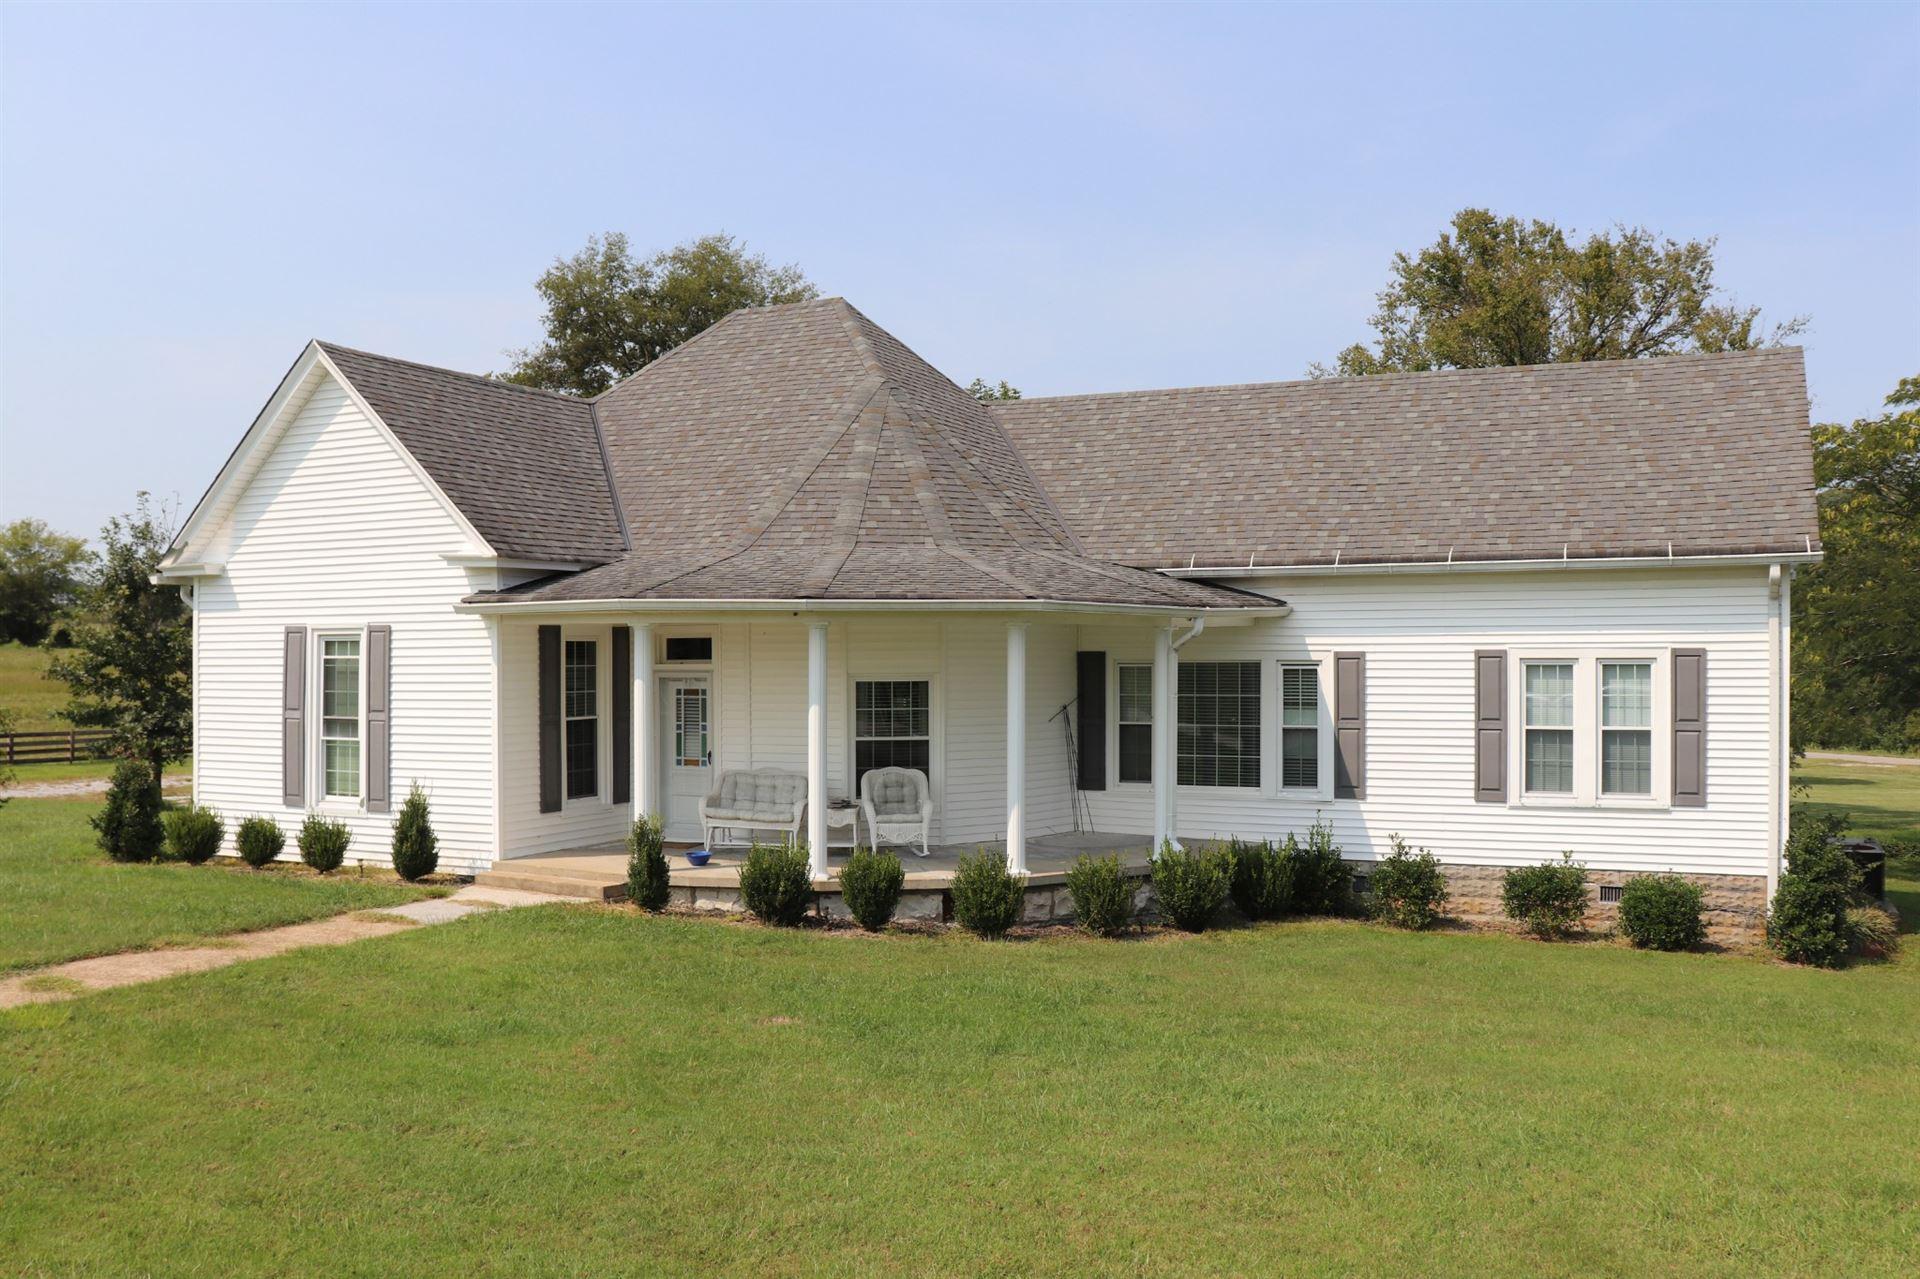 2025 Honeysuckle Rd, Hartsville, TN 37074 - MLS#: 2290684